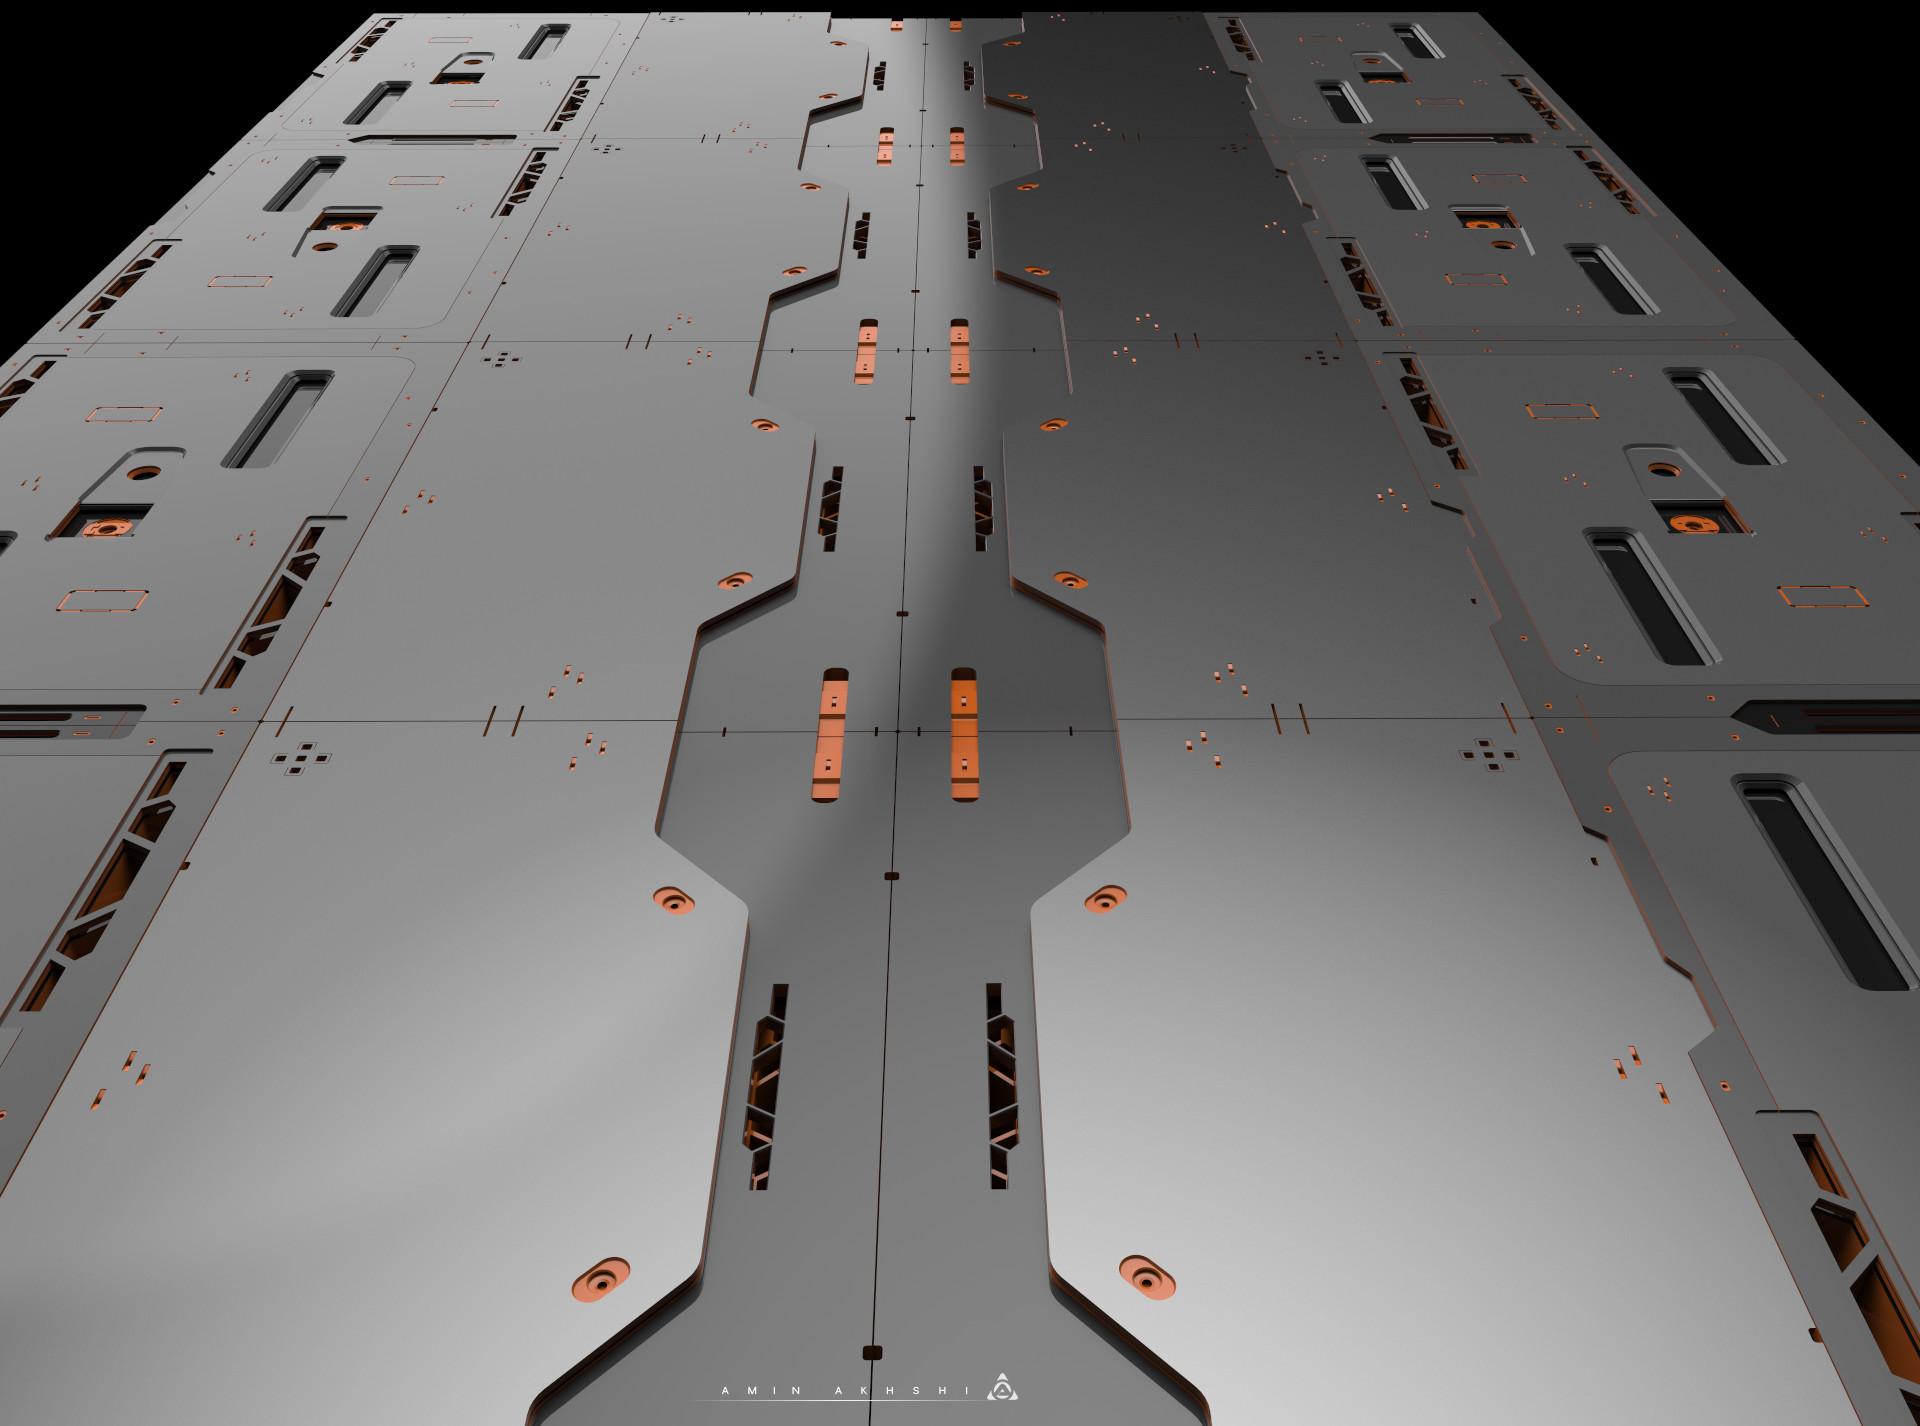 Amin akhshi sci fi floor panels 005